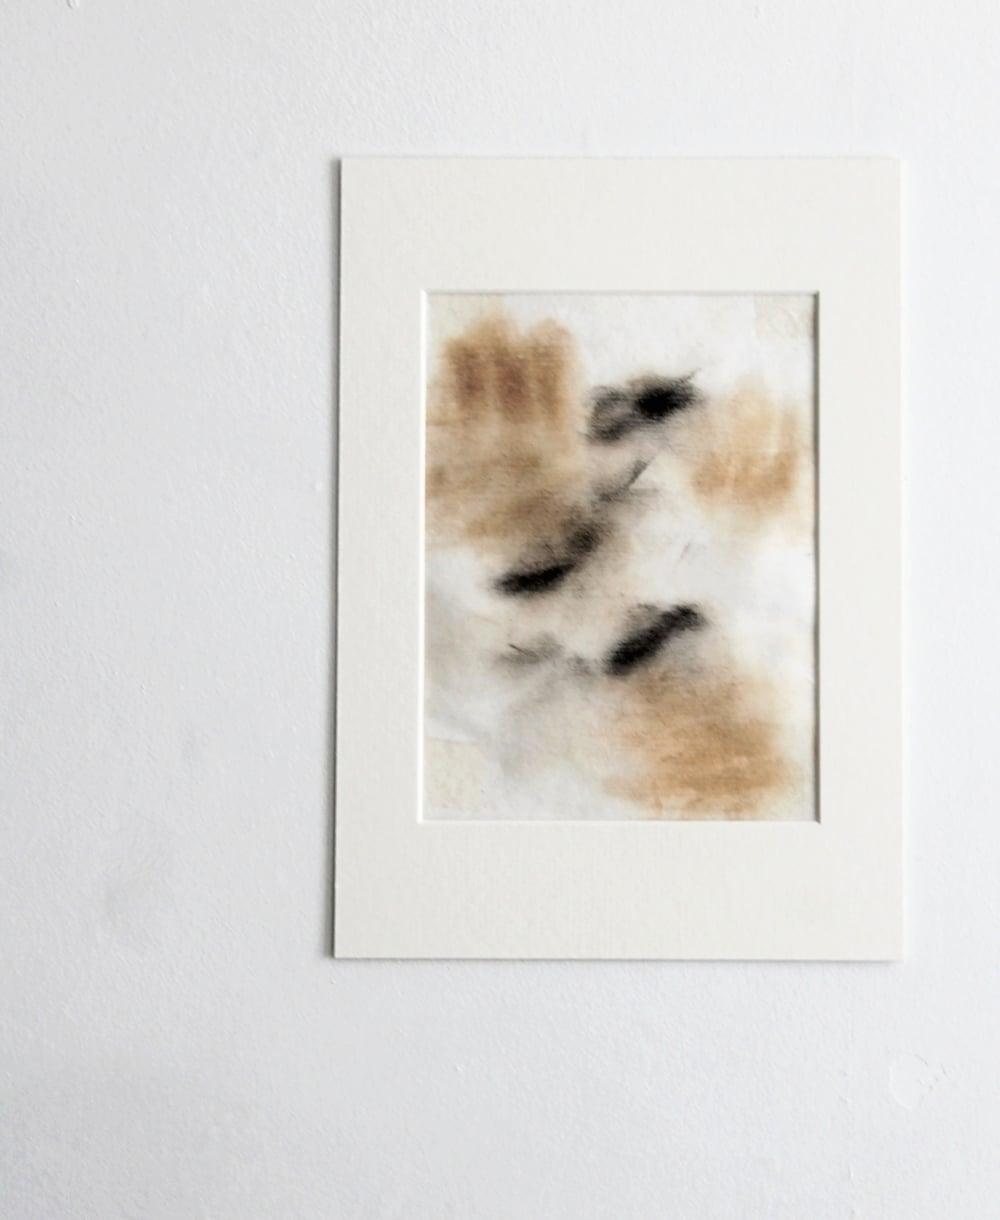 Self-Portrait; Face-wipe